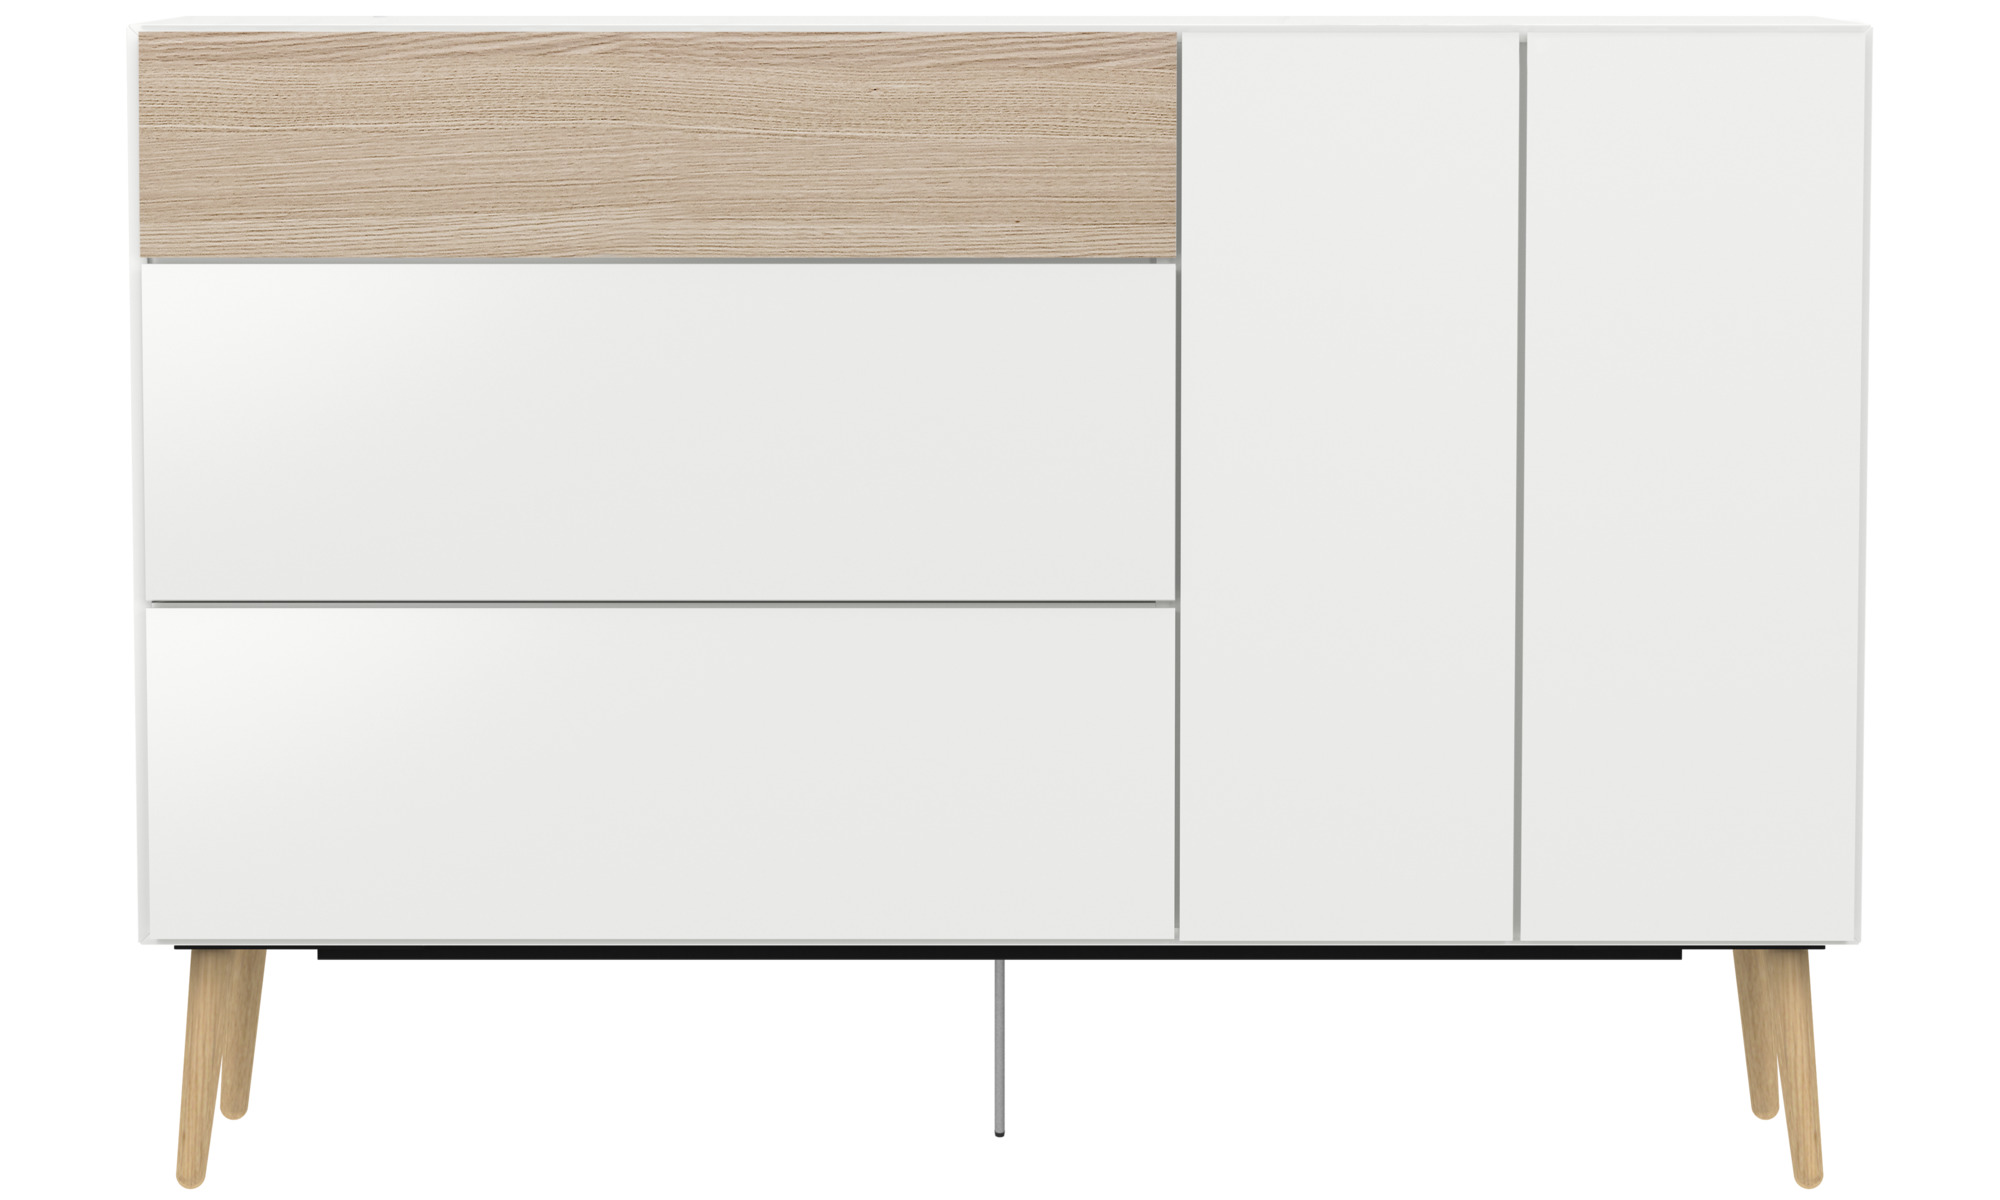 Buffets - buffet Lugano avec tiroirs et porte abattante - Blanc - Laqué